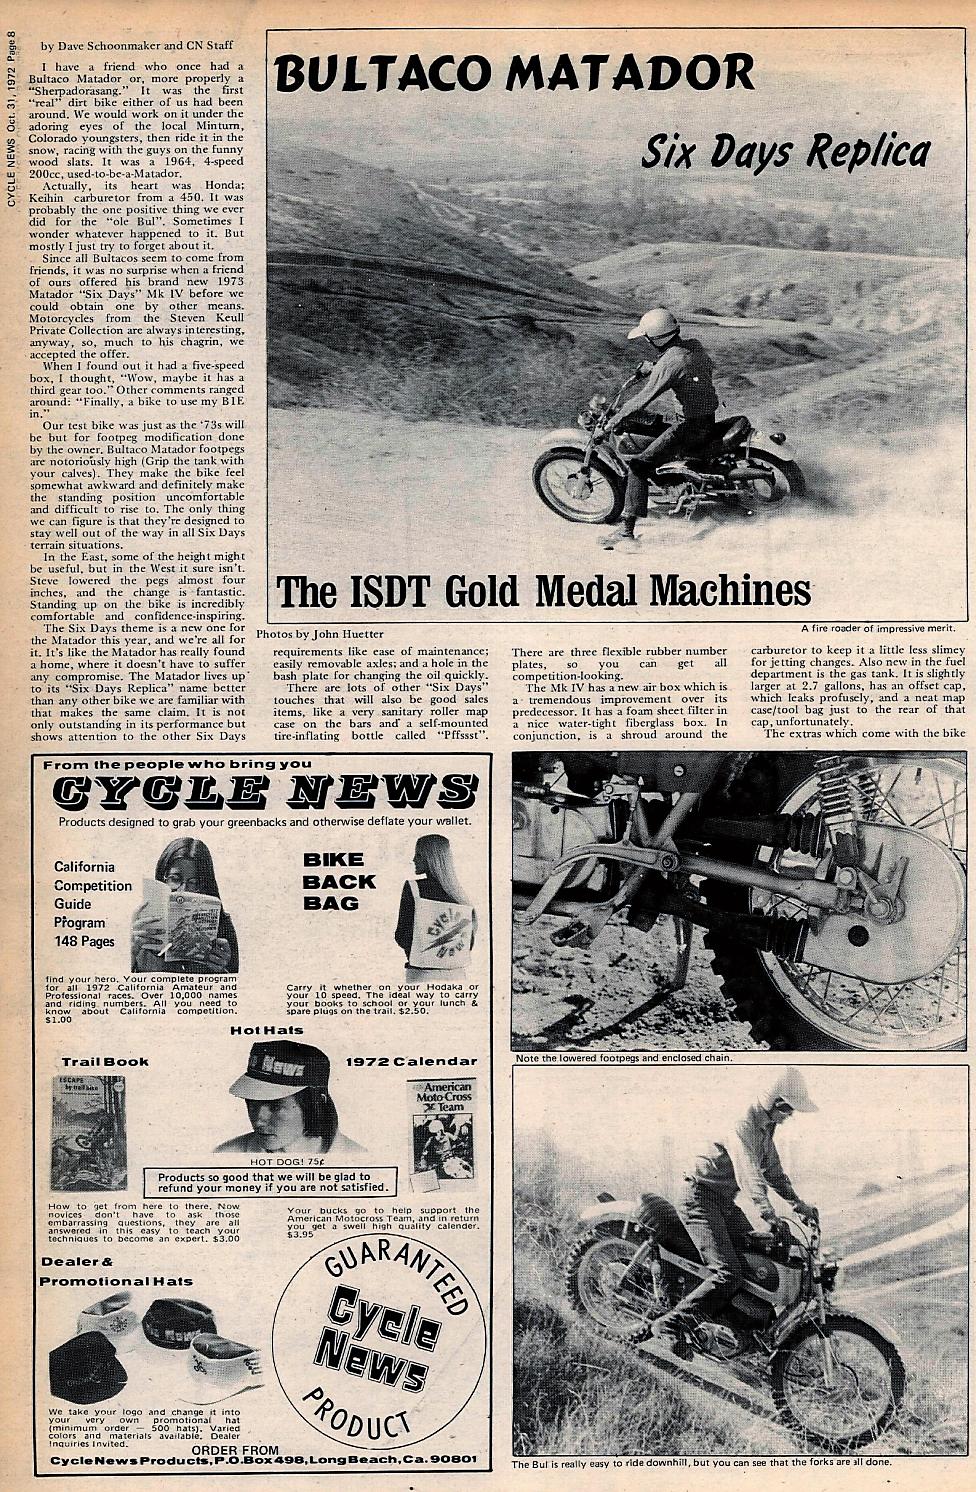 1973 Bultaco Matador road test.1.jpg